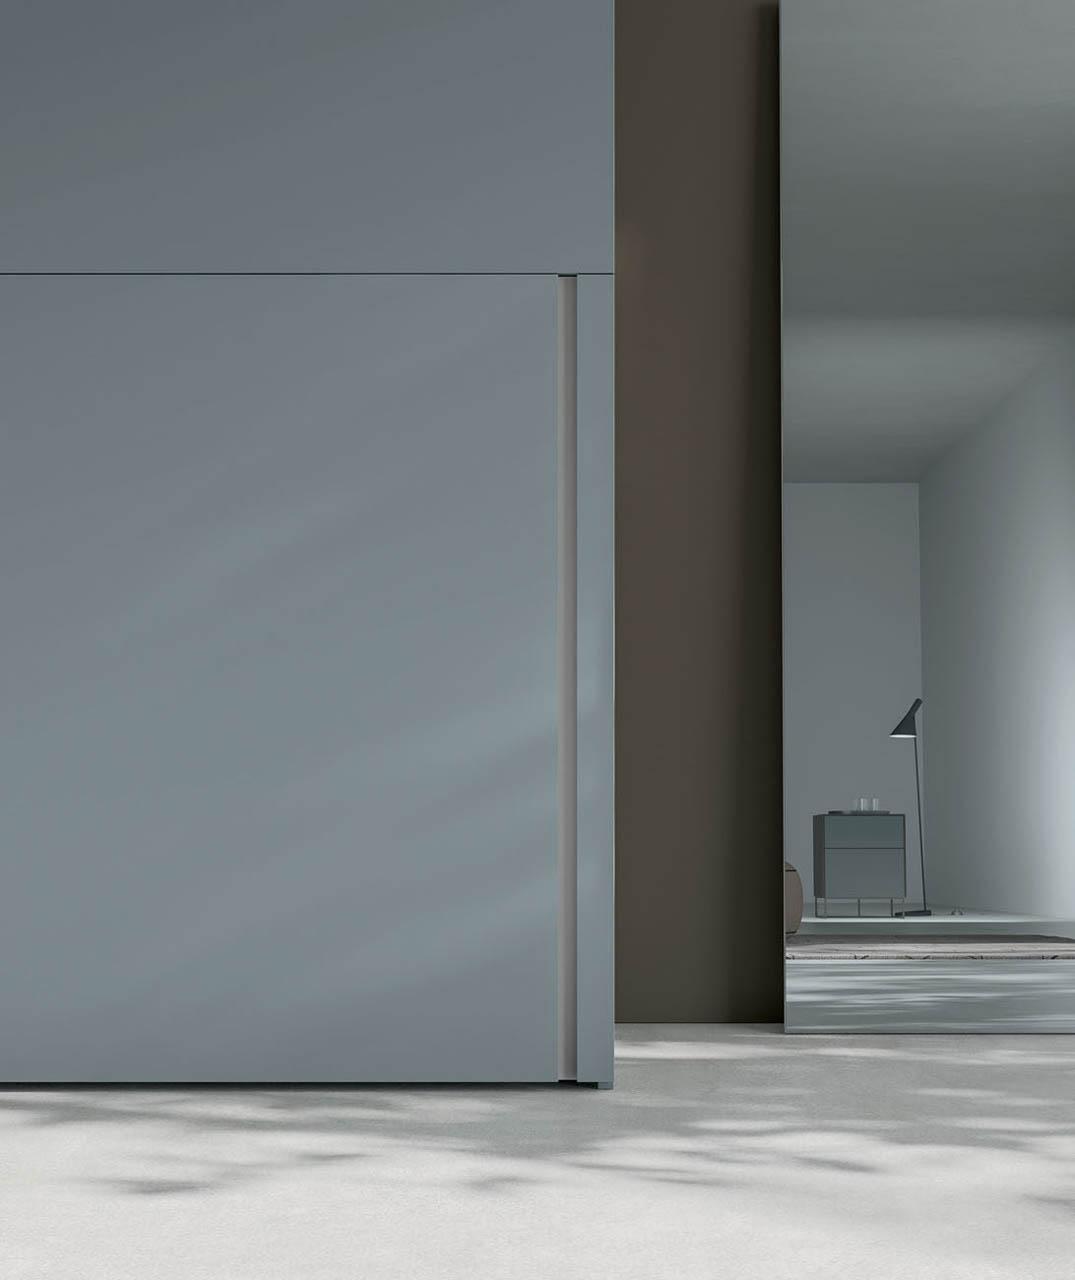 armadio-scorrevole-anta-virgo-3-orme-1092x1300